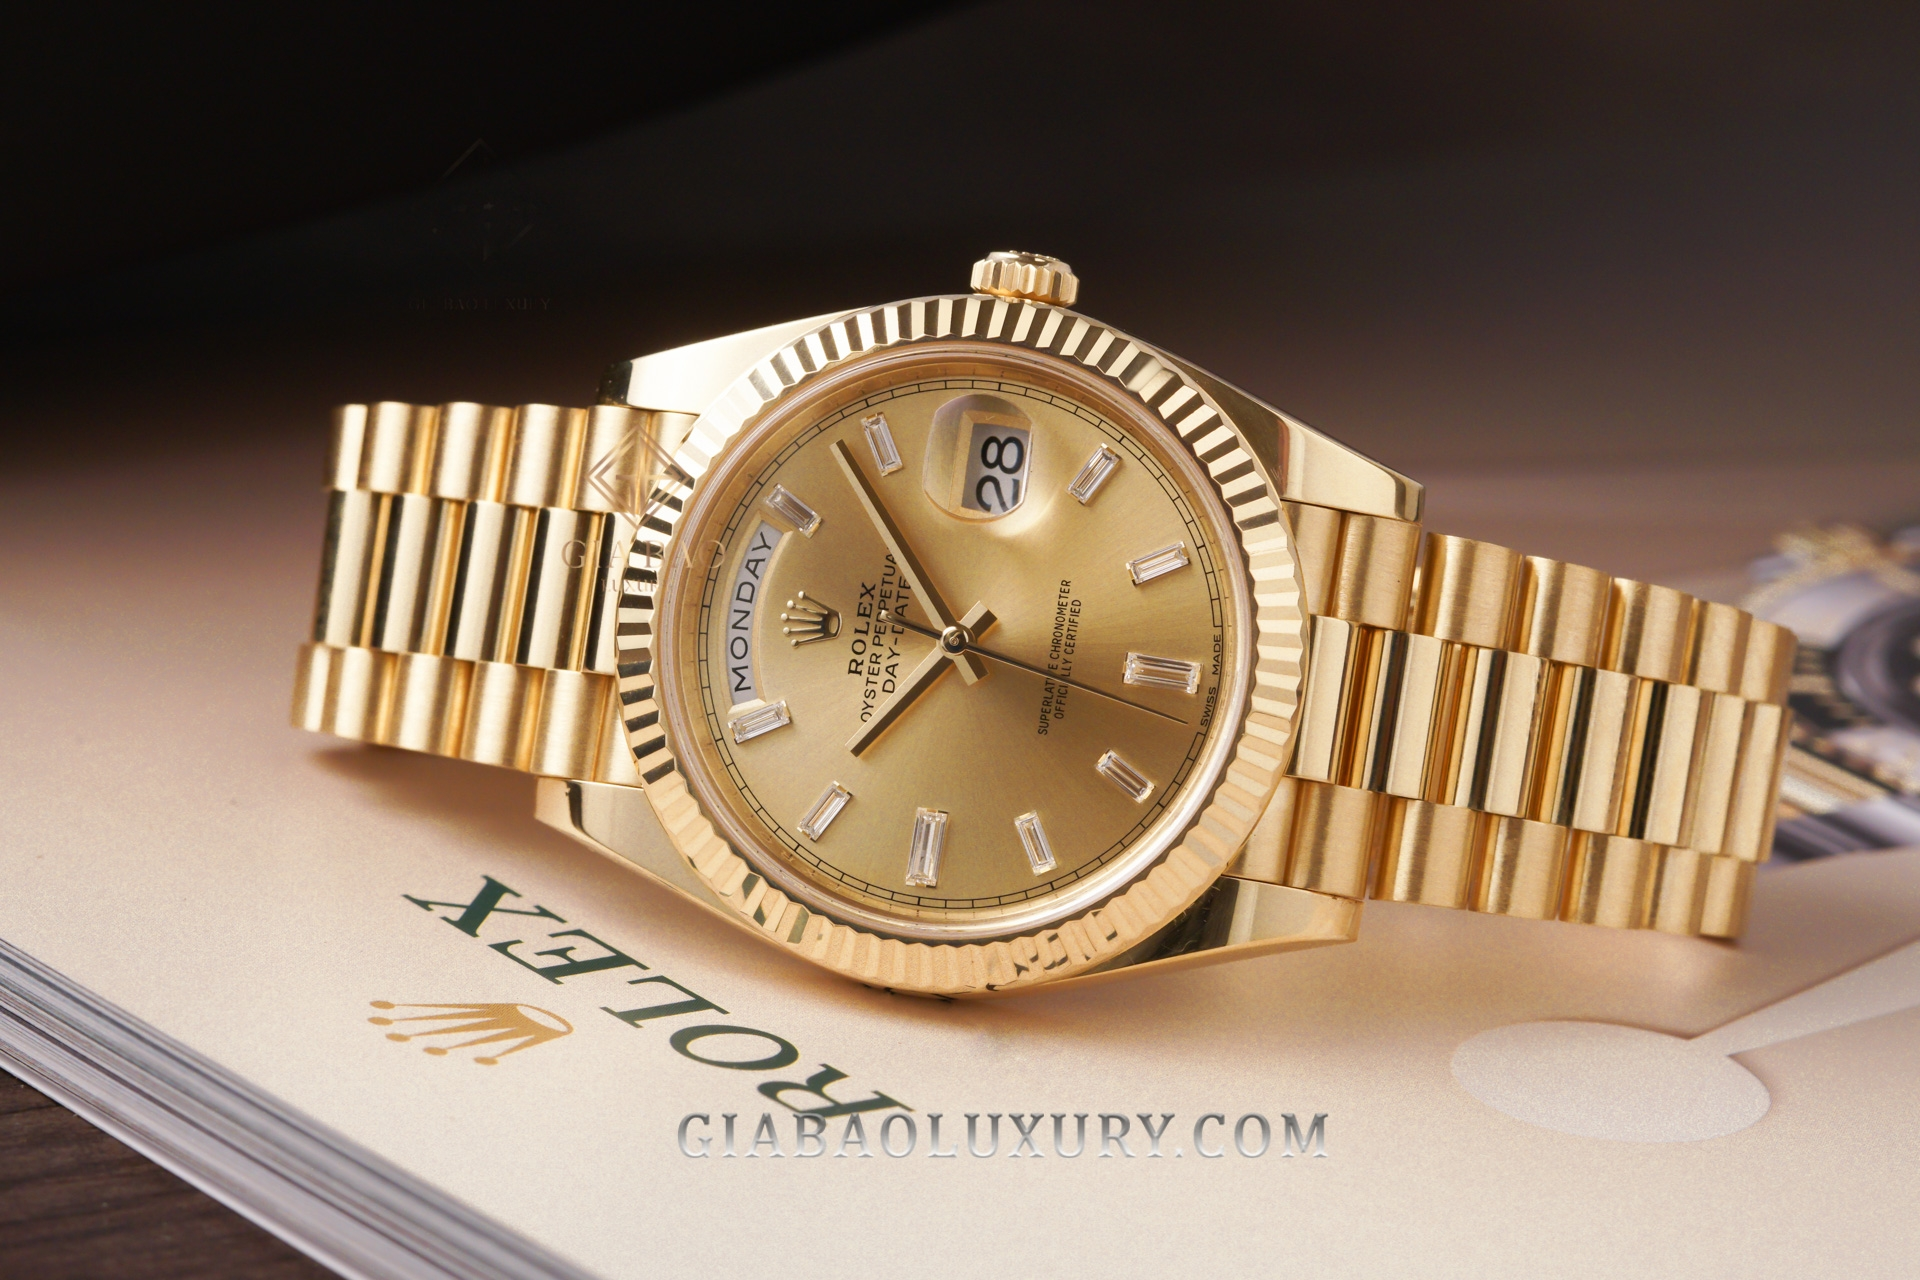 Đồng Hồ Rolex Day-Date 40 228238 Mặt Số Champagne Cọc Số Kim Cương